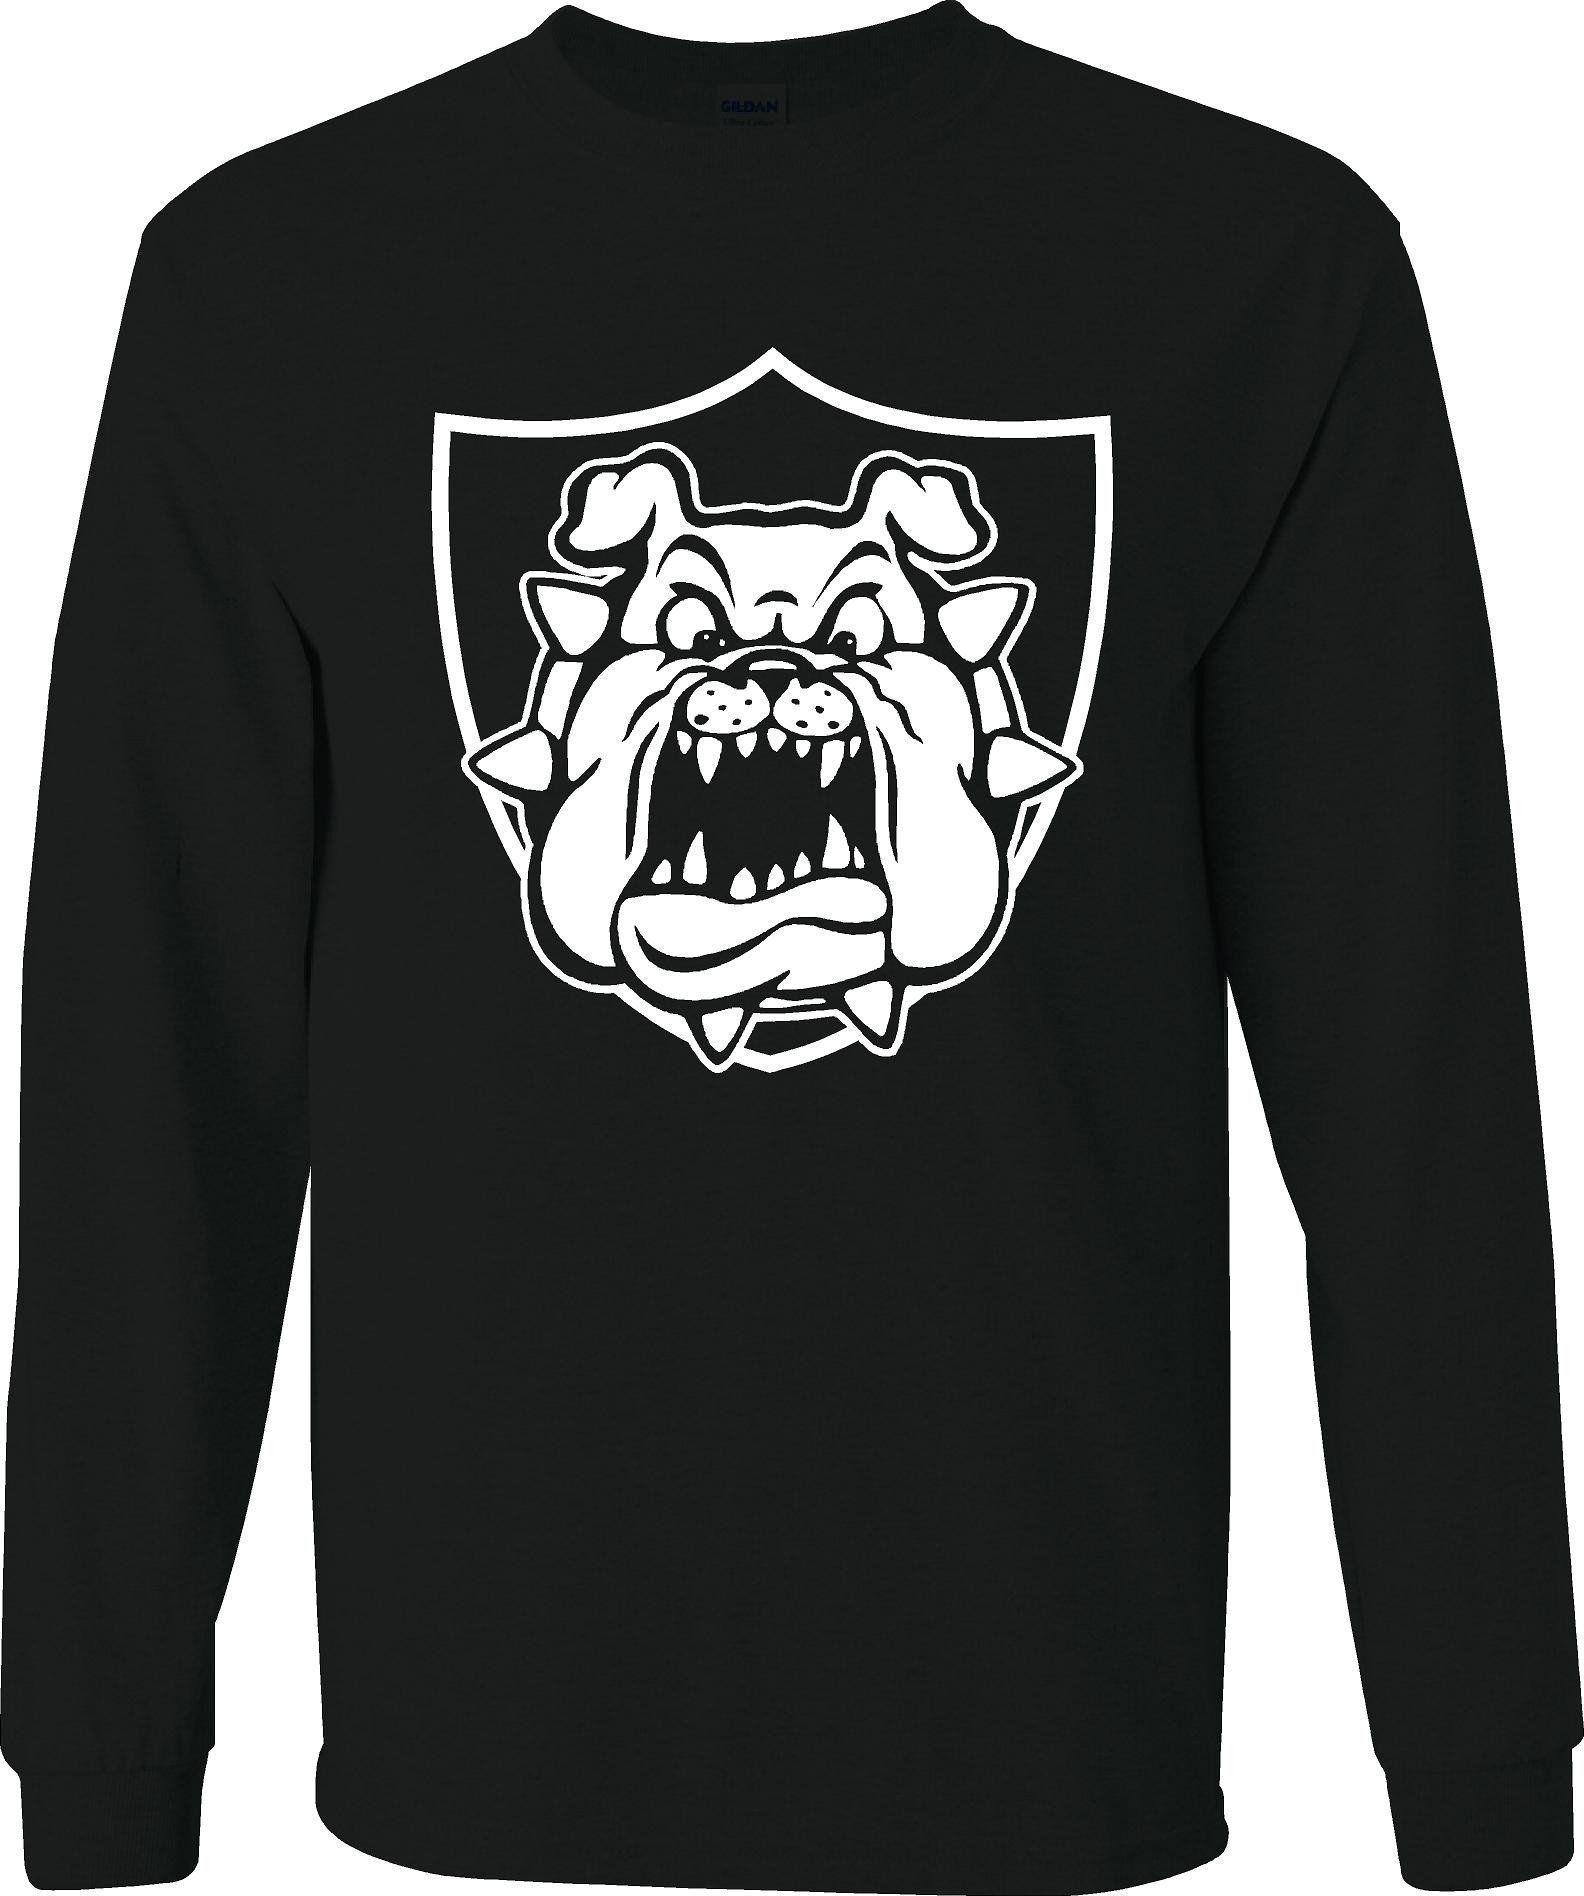 1b10c6339 Derek Carr Raider Bulldog - Raiders 4 Life Sweater | Johnson Family ...